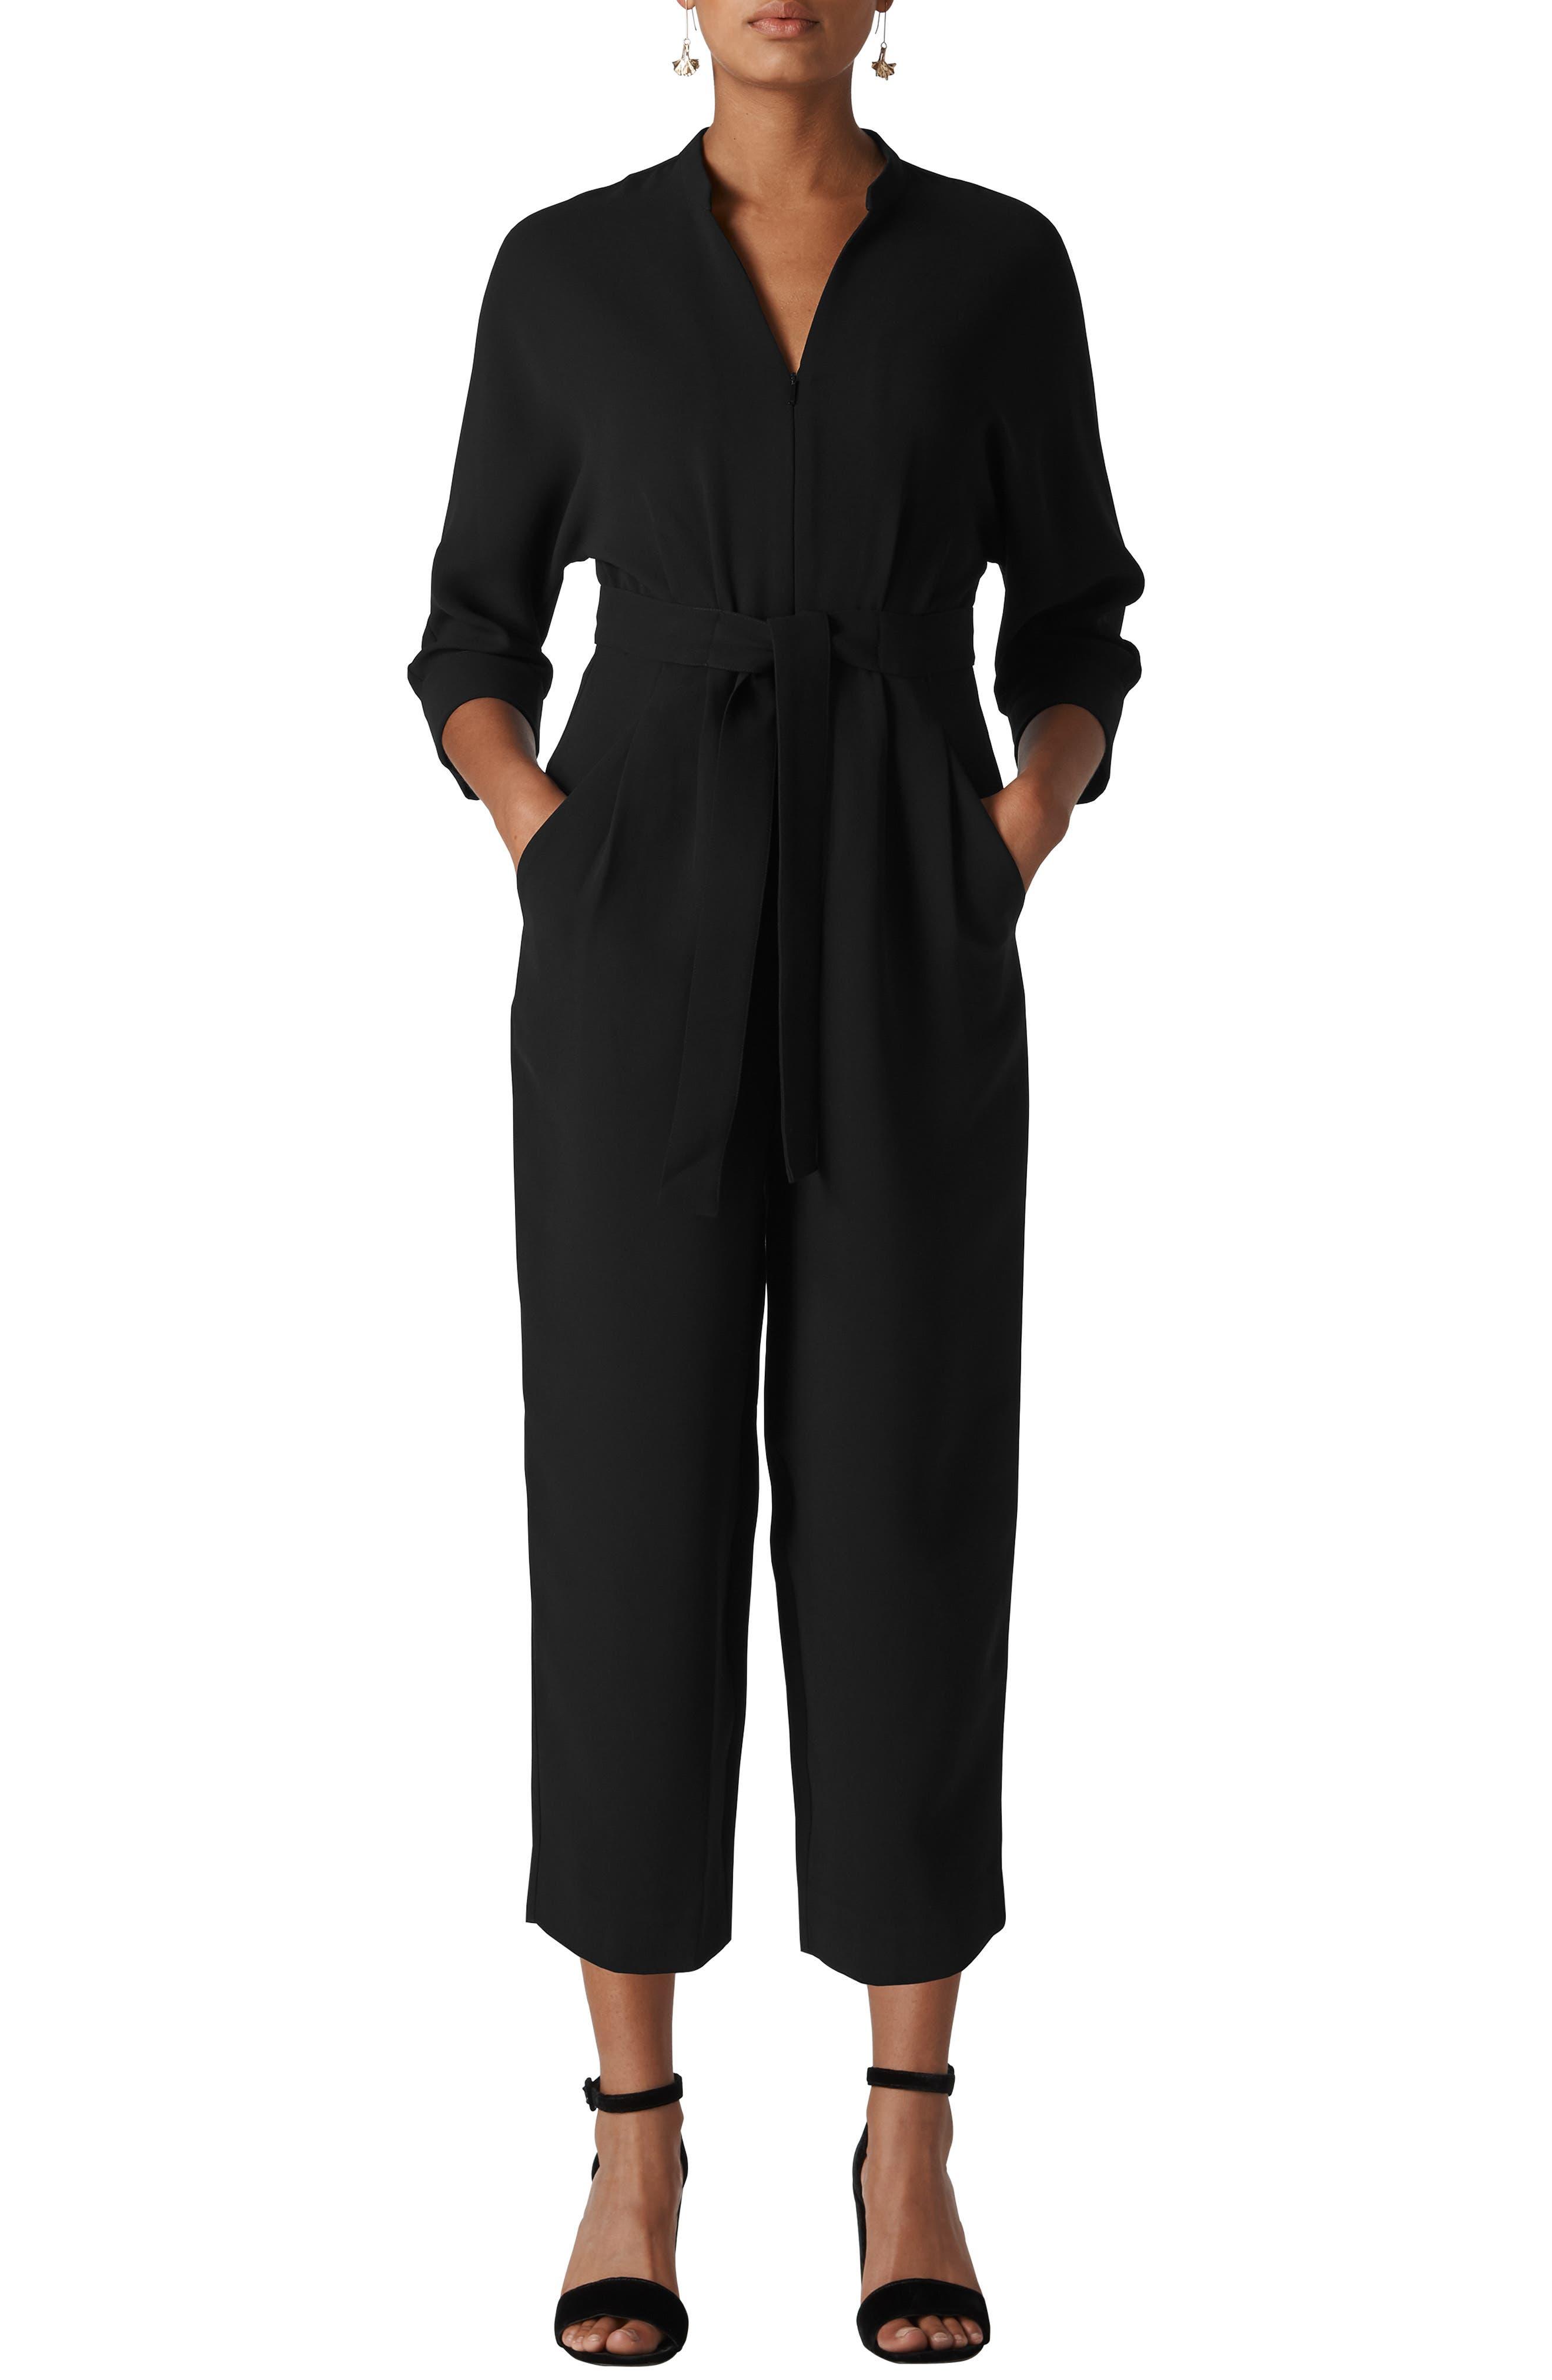 WHISTLES Arabella Zip Front Belted Jumpsuit in Black